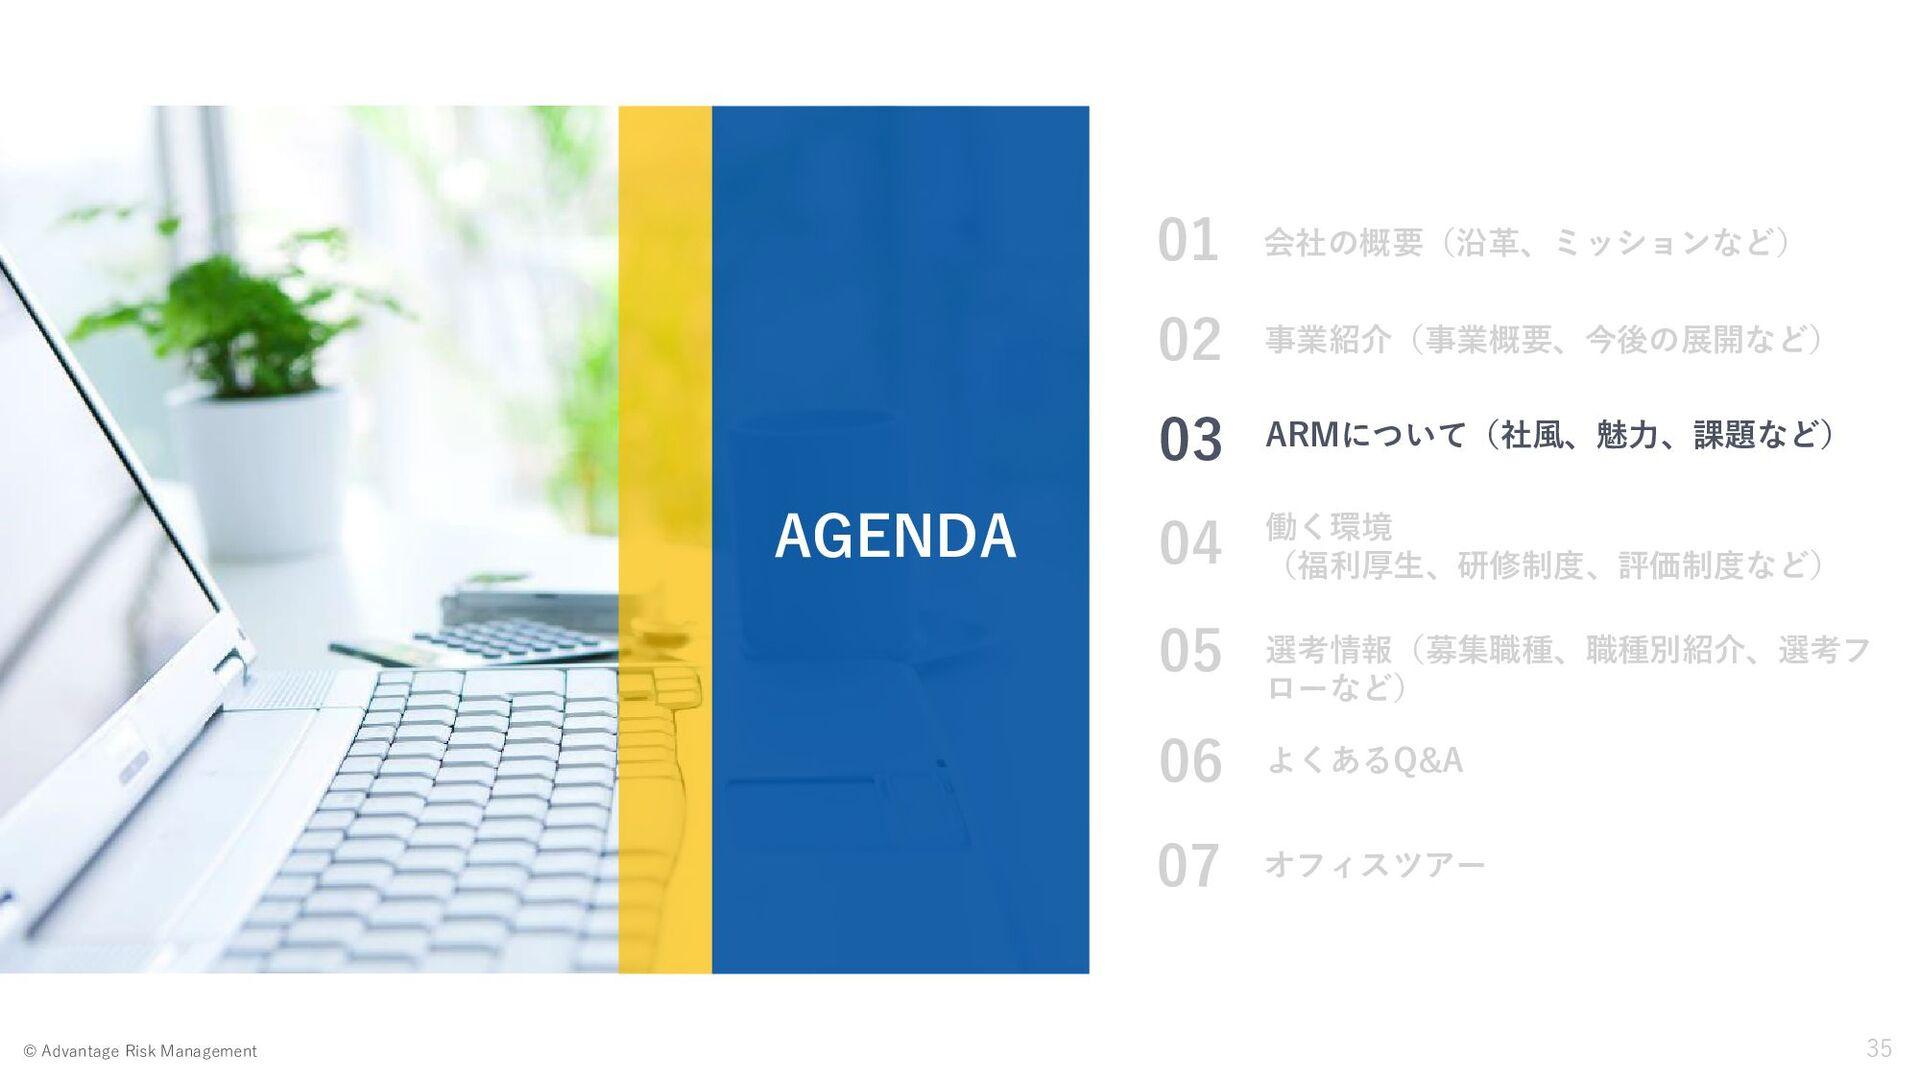 Page 35 2020 Advantage Risk Management © 選考フロー(...